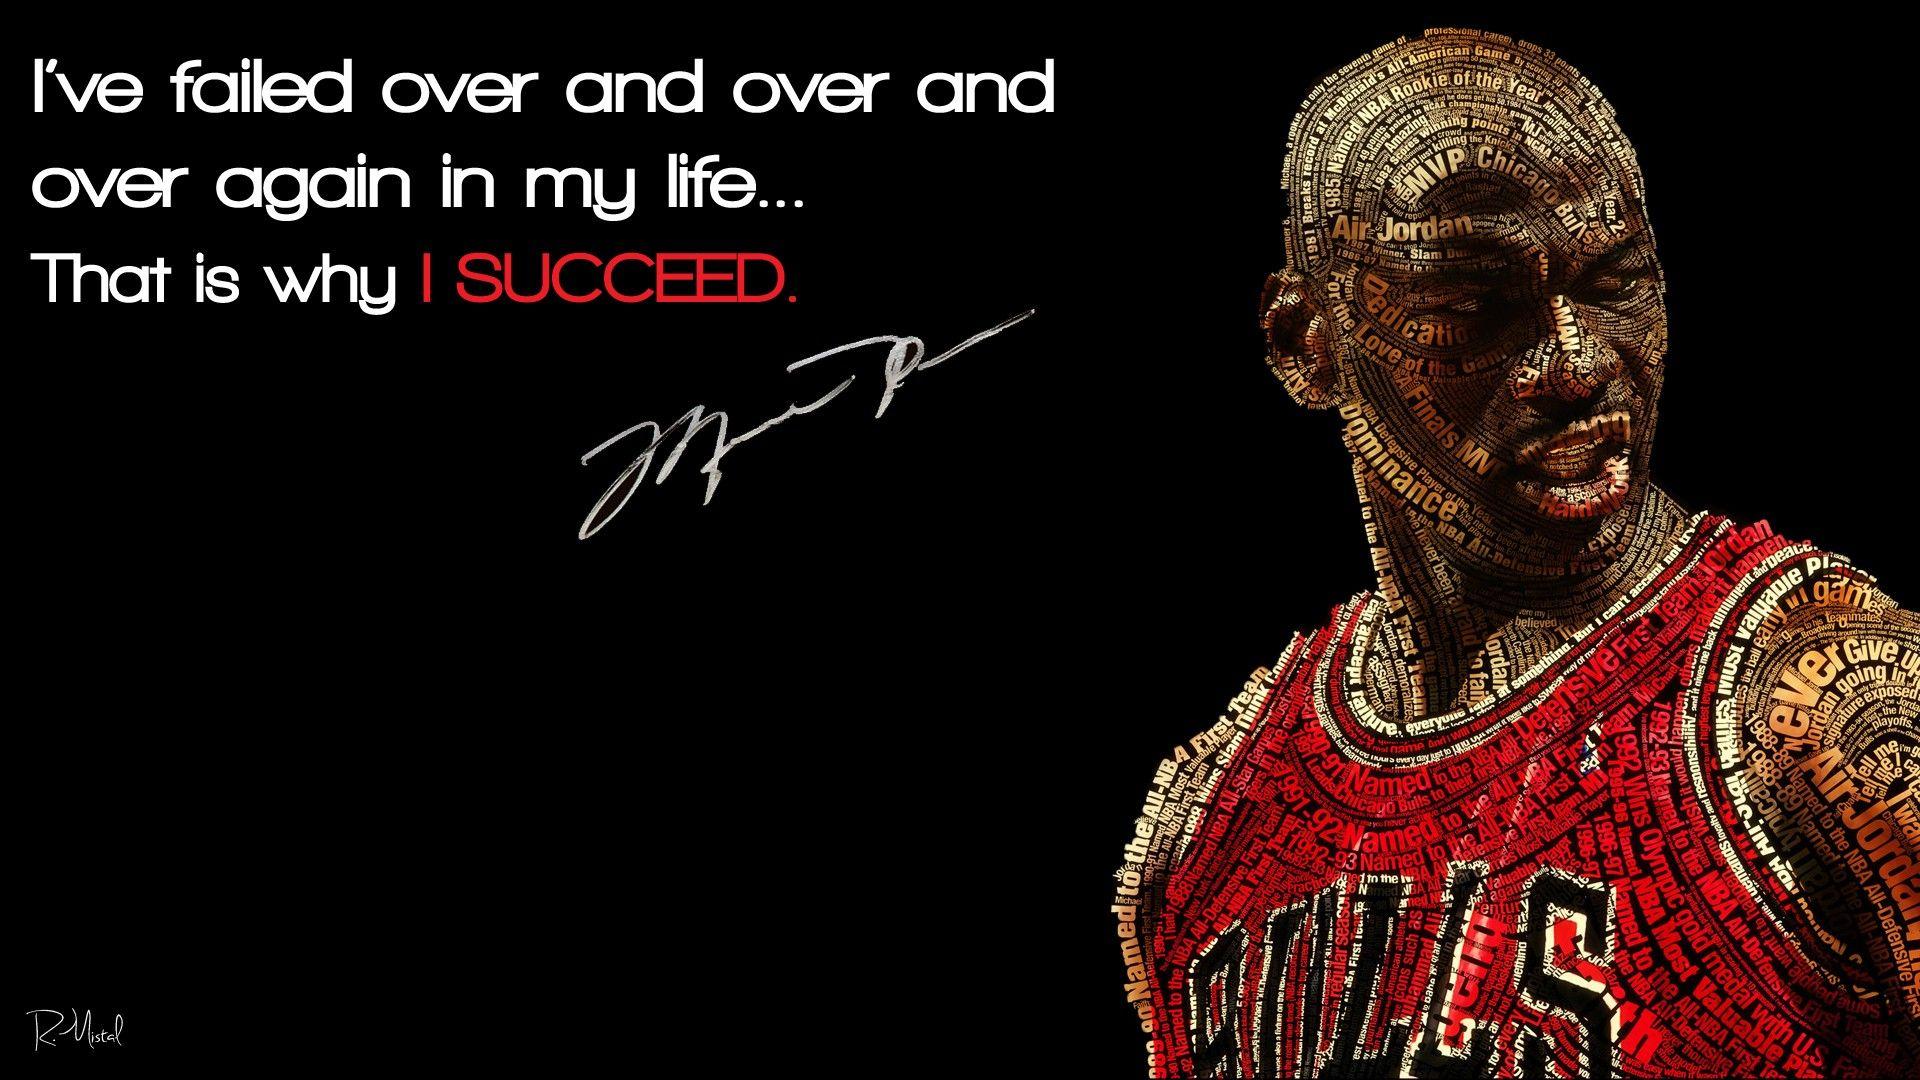 I've failed over and over again – Michael Jordan 1920 x 1080